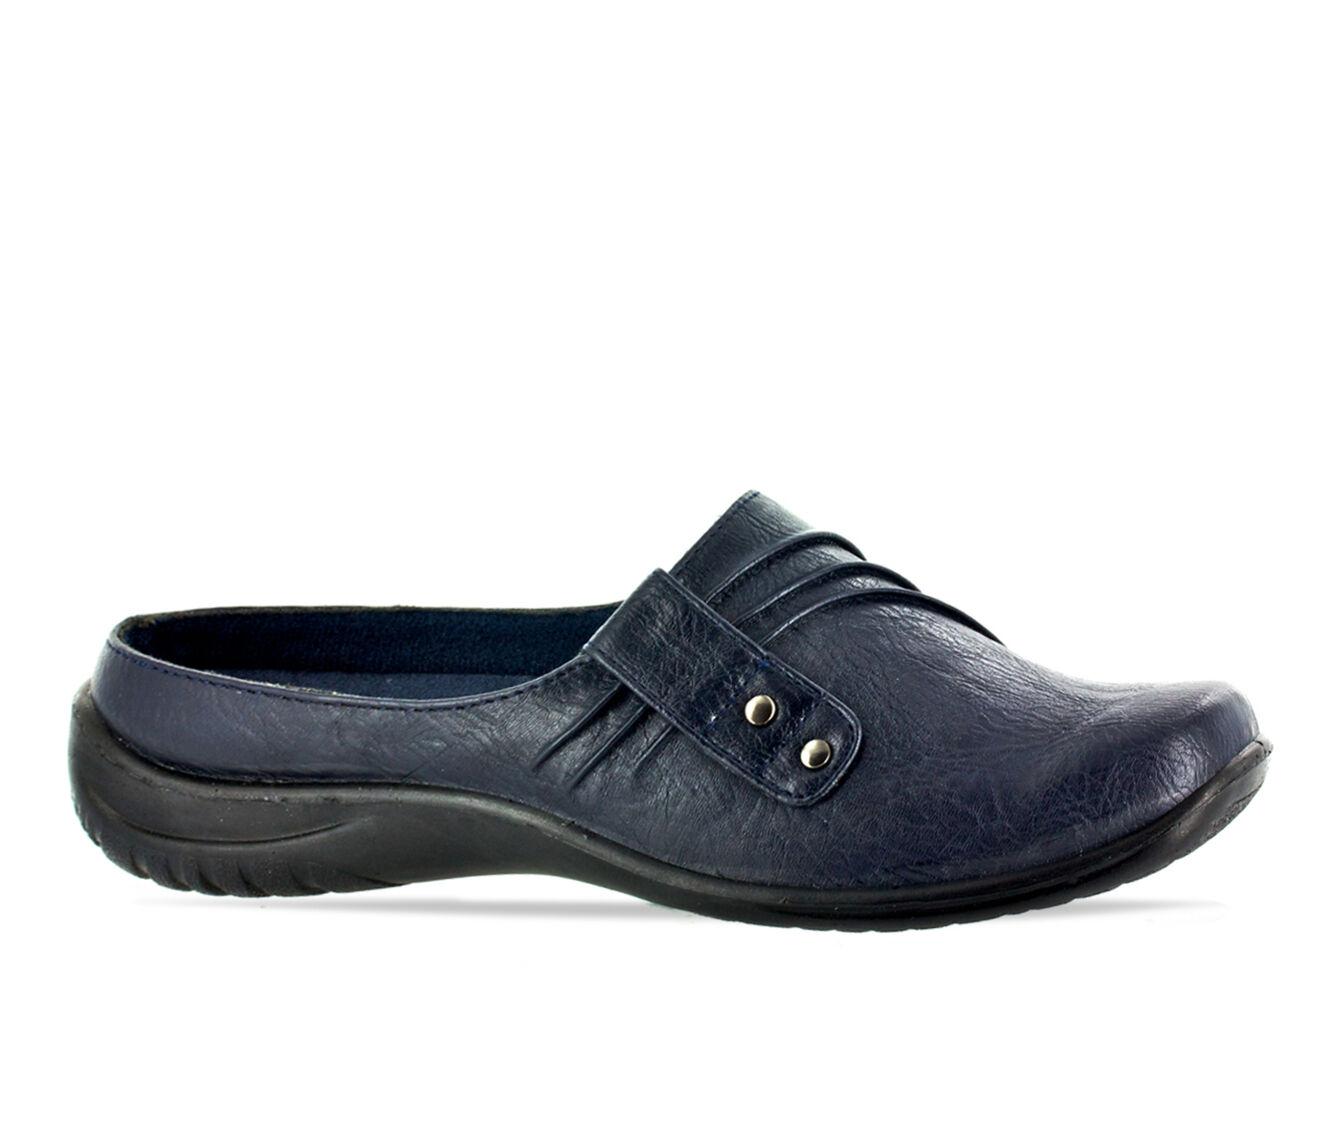 uk shoes_kd5786